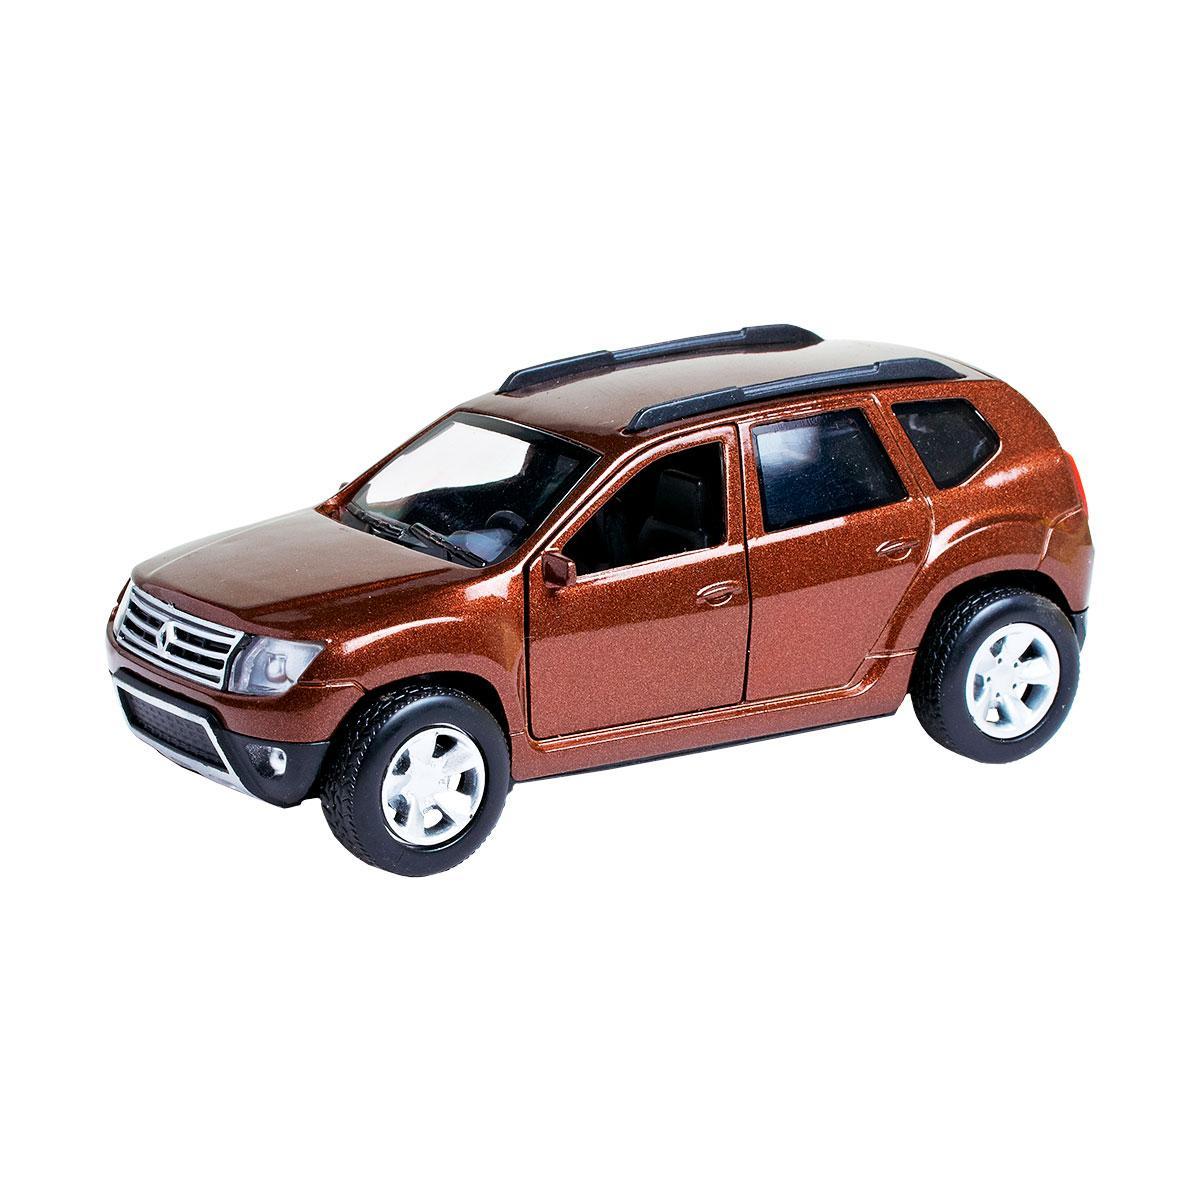 Technopark Автомодель Renault Duster-M коричневый 1:32, DUSTER-MBr